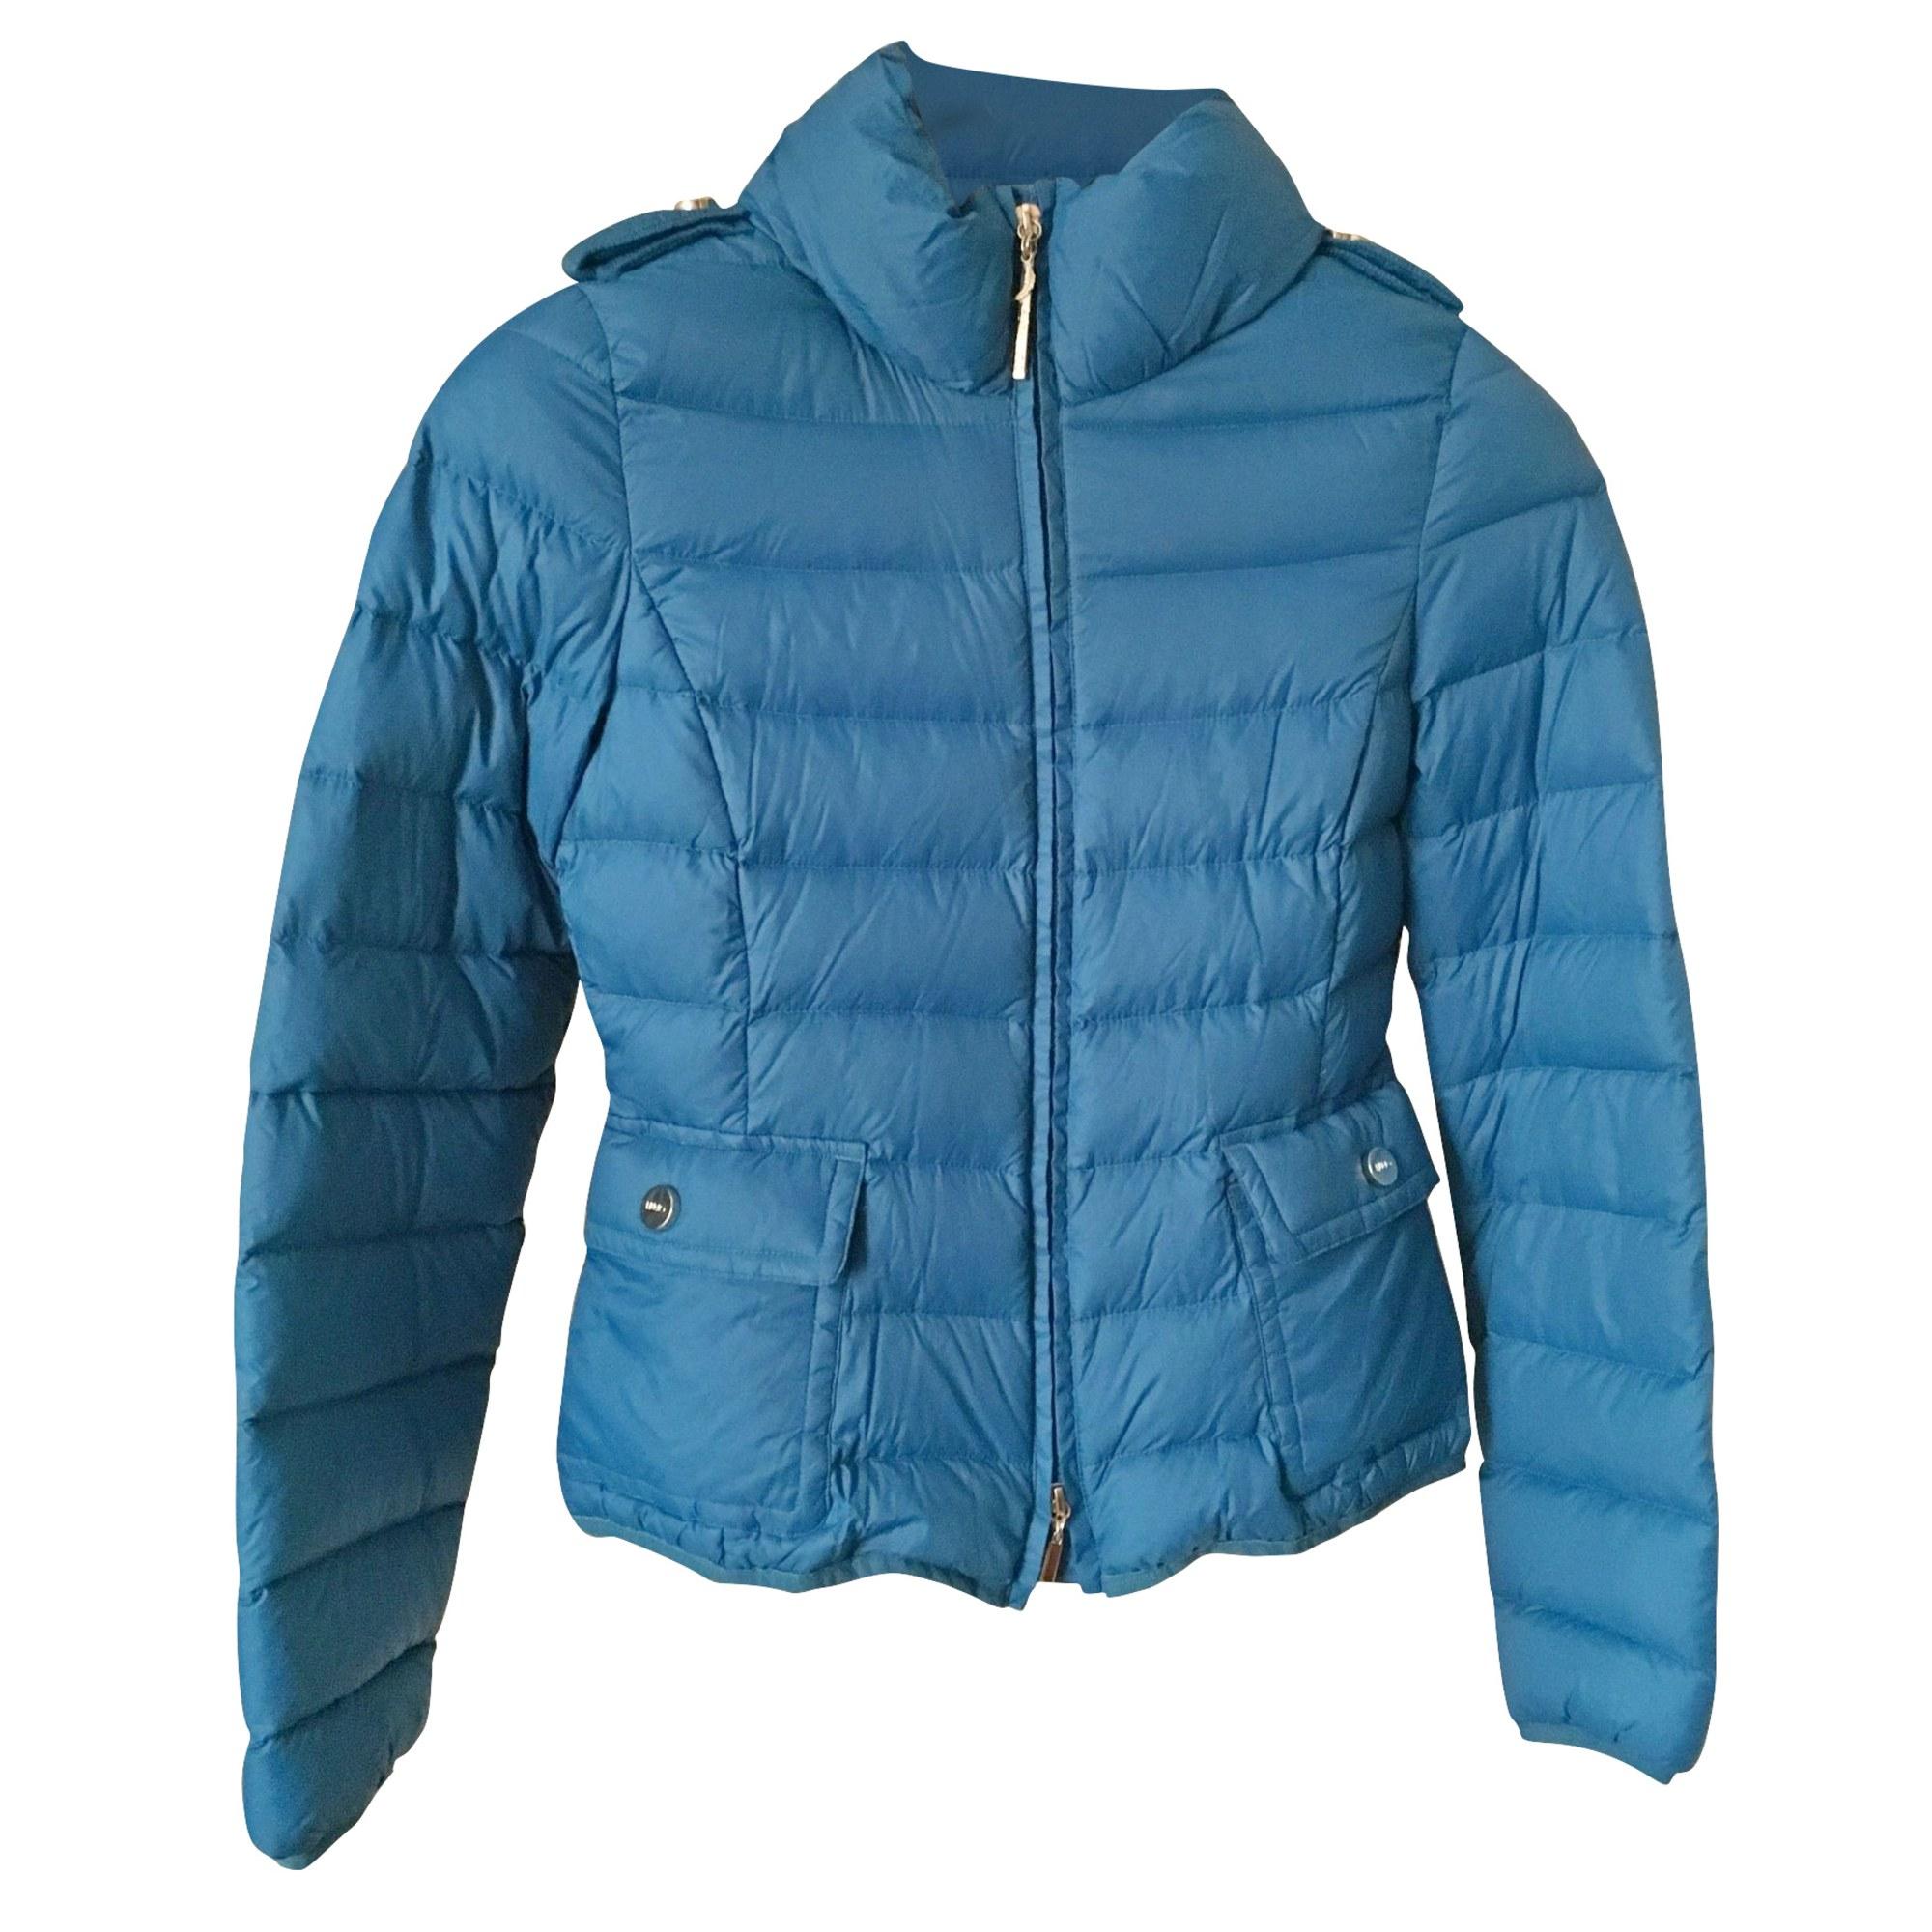 Doudoune LIU JO Bleu, bleu marine, bleu turquoise